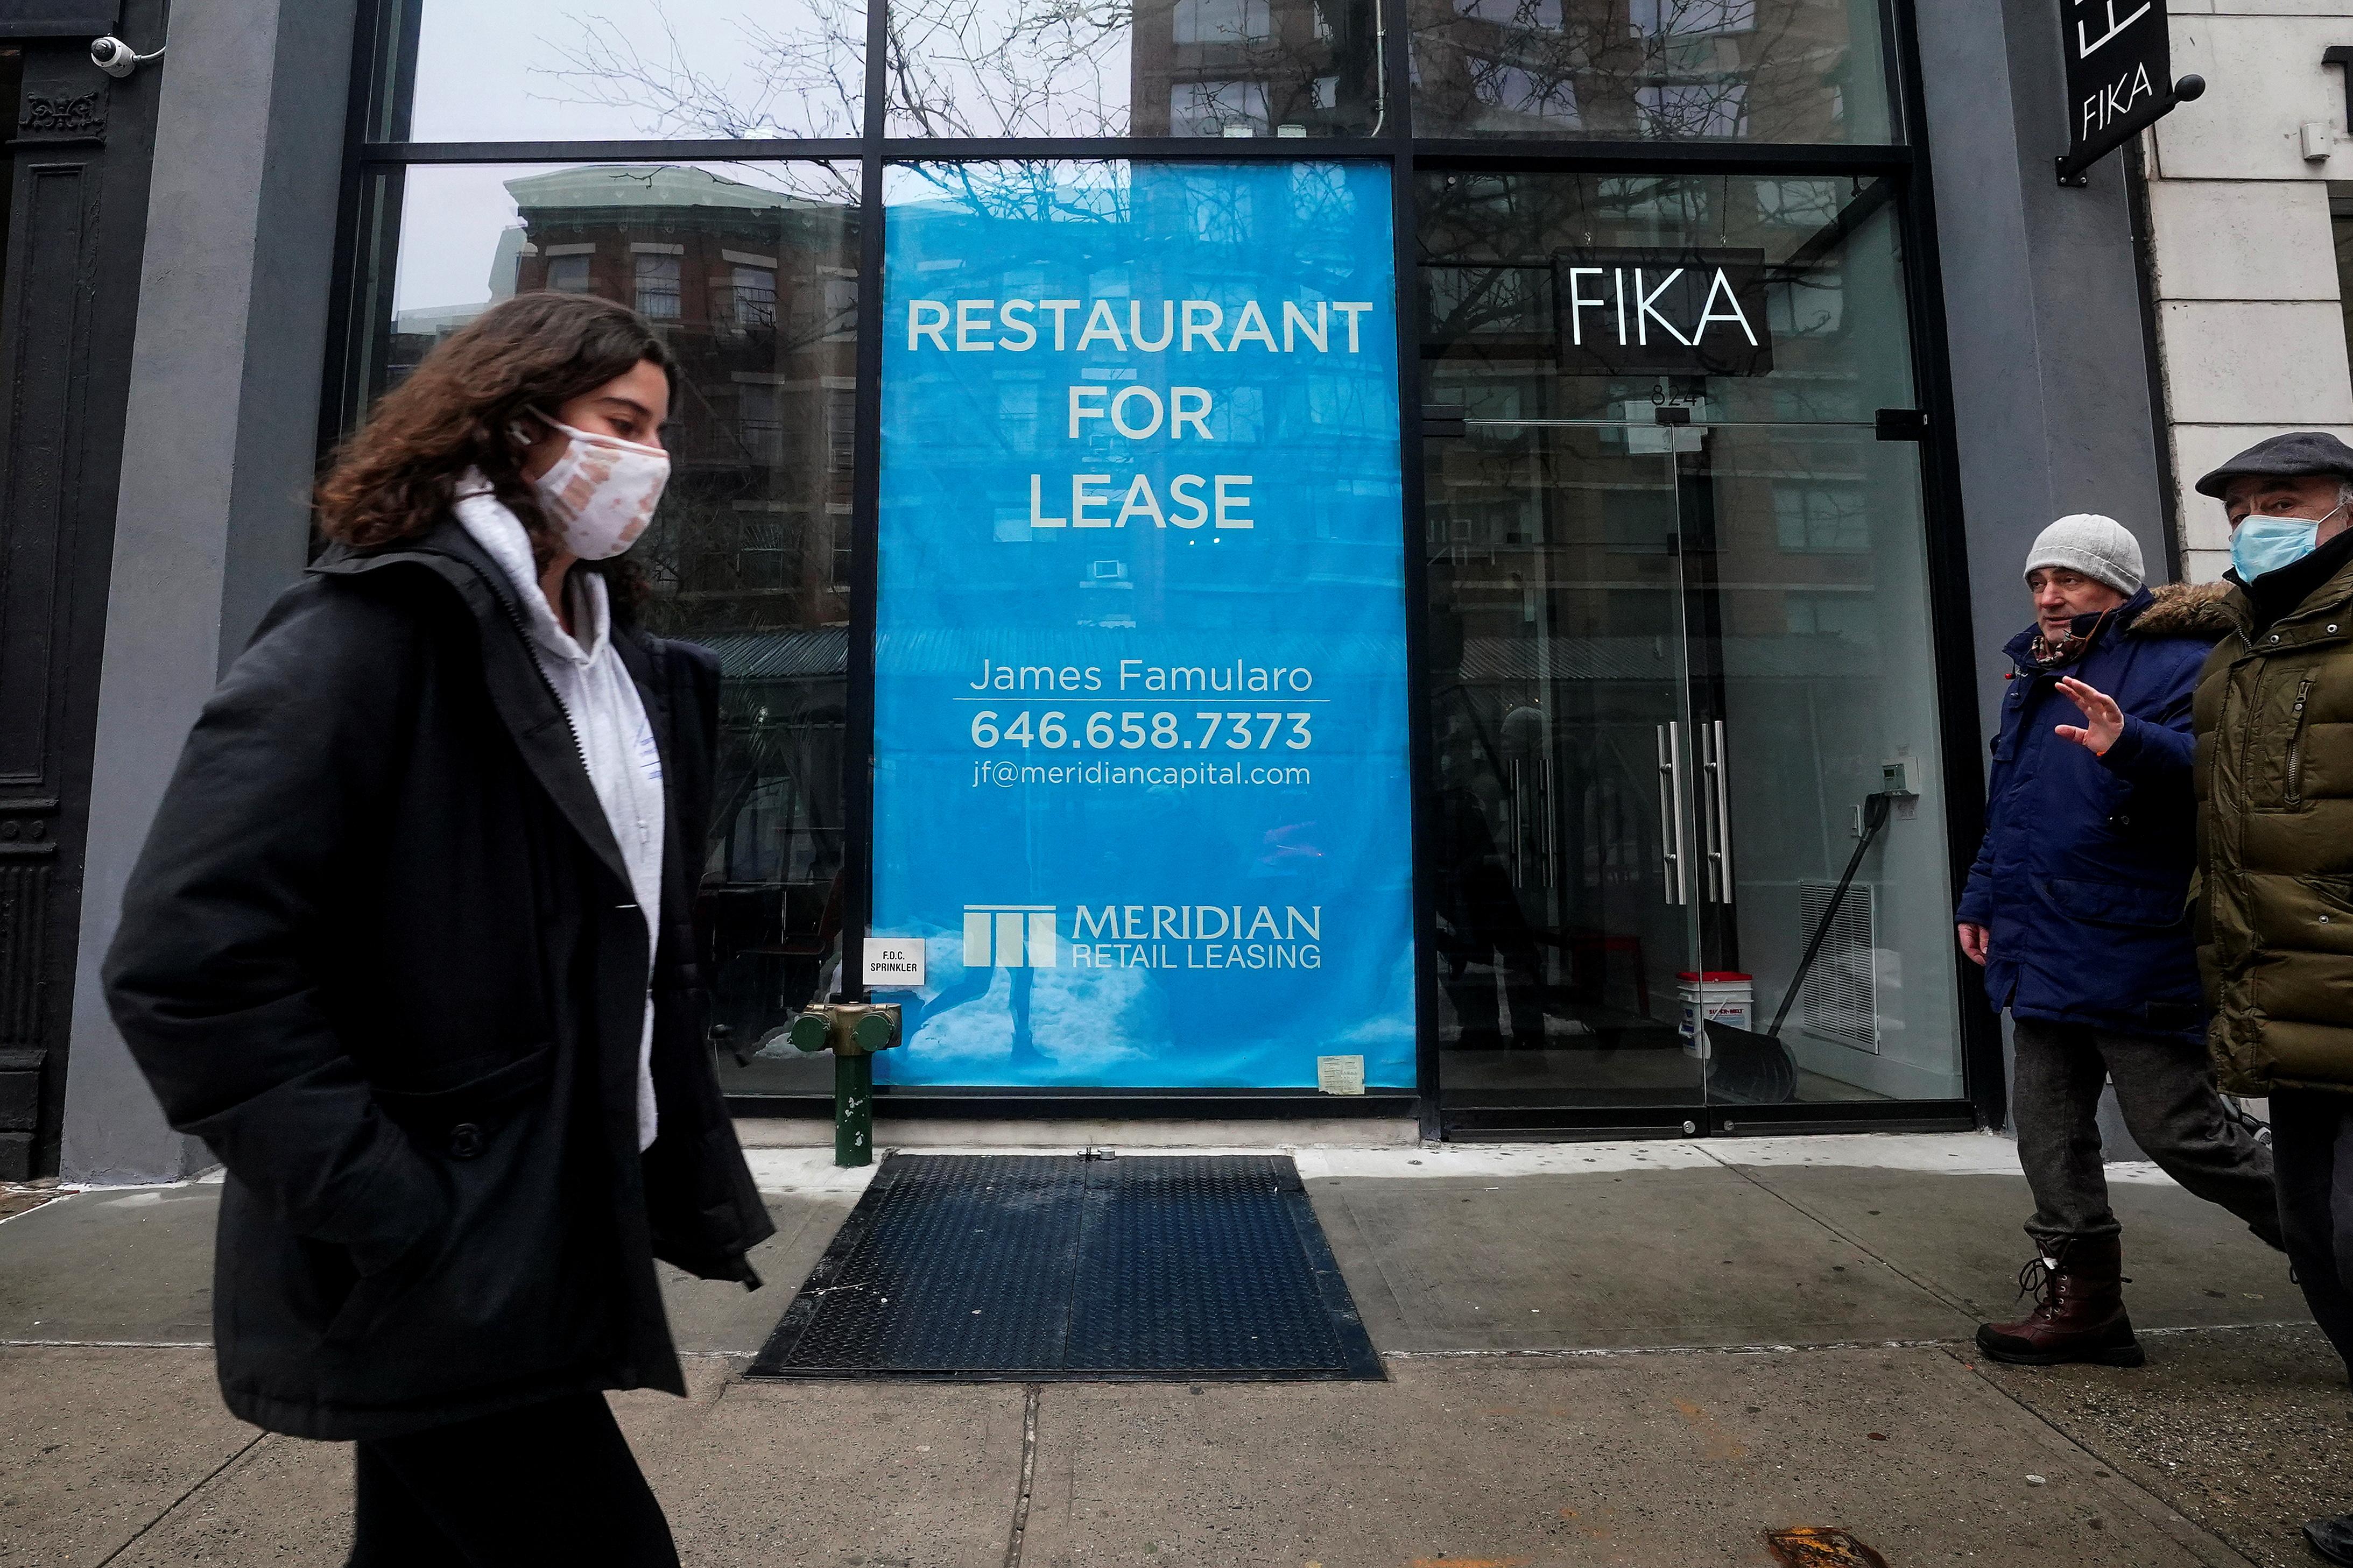 People walk past a shuttered restaurant amid the coronavirus disease (COVID-19) pandemic in the Manhattan borough of New York City, New York, U.S., February  9, 2021. REUTERS/Carlo Allegri